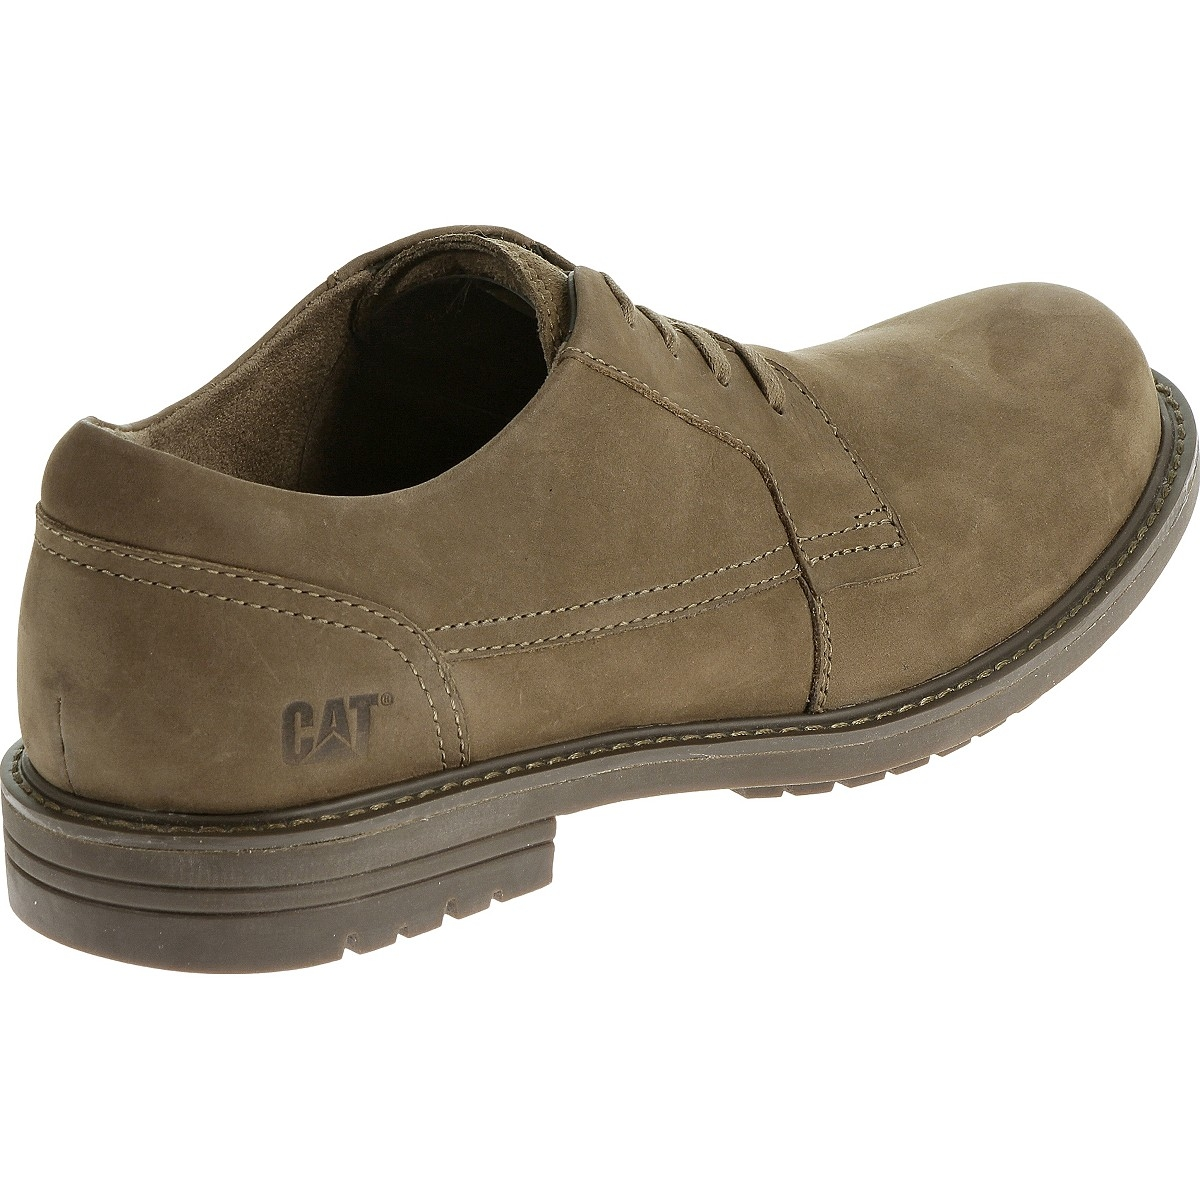 bfe9585a2828f ... Image of CAT Cason Shoes (Men's) - Newt ...